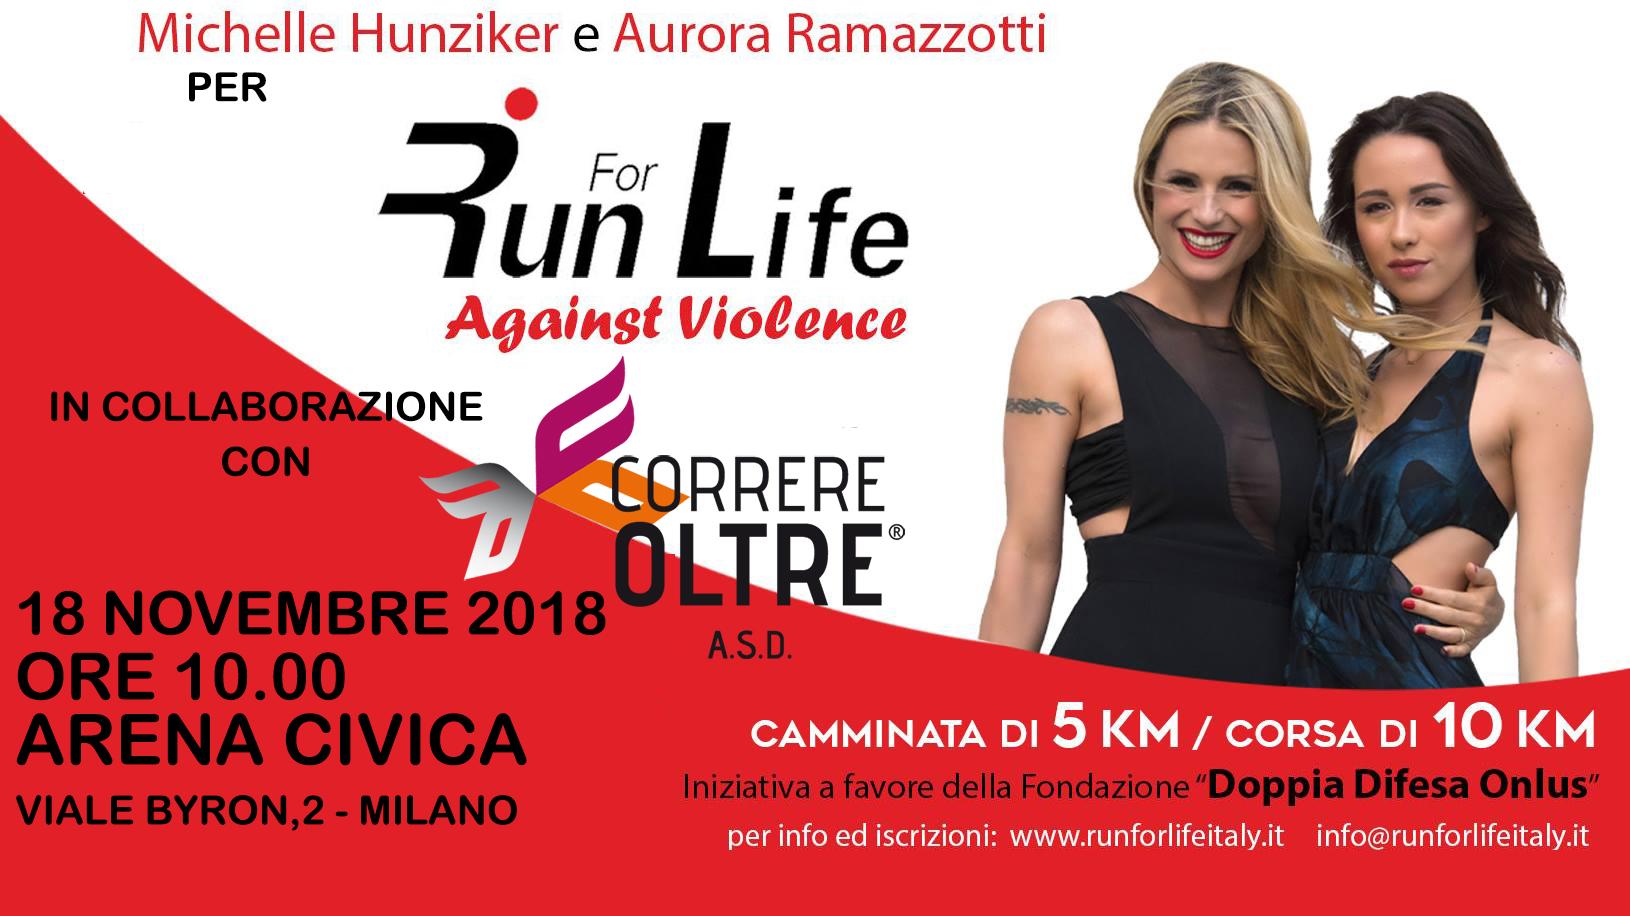 correre oltre per runforlife